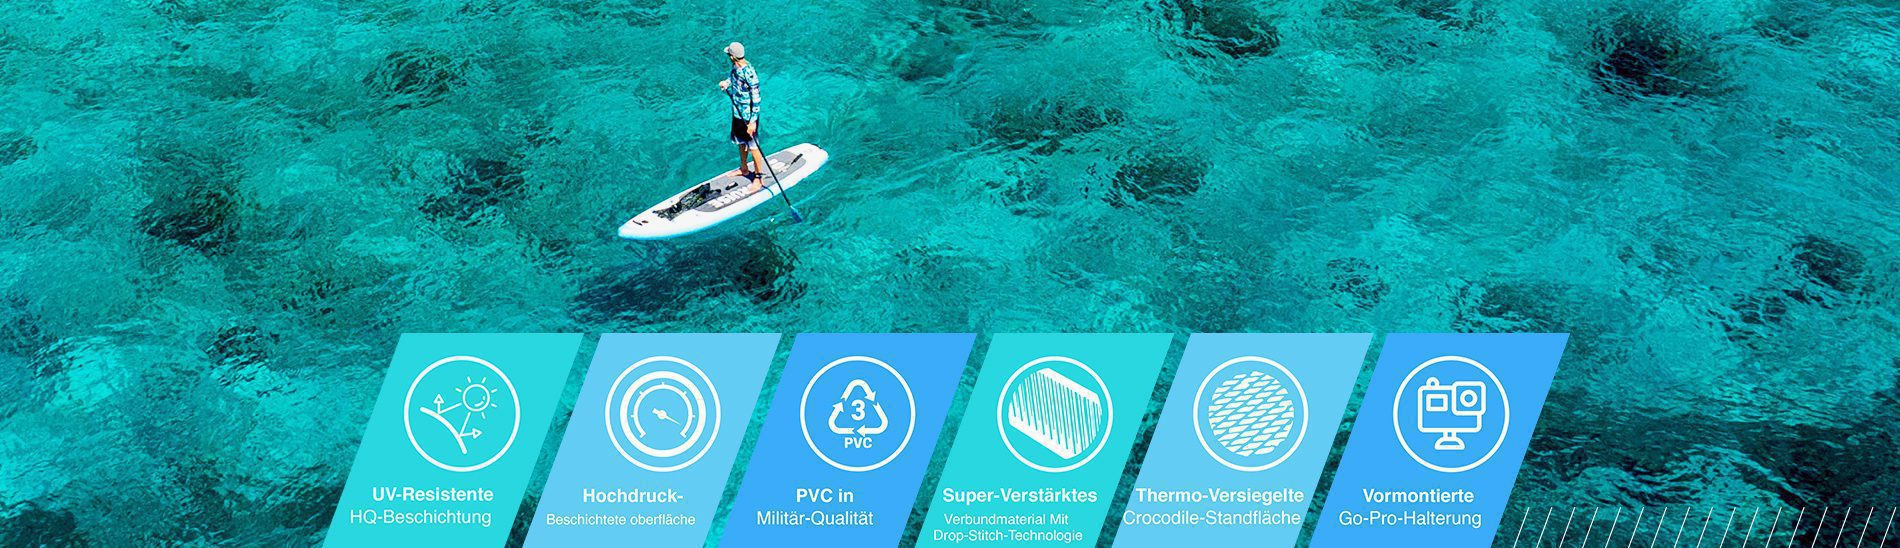 Bluefin stand up paddle board aufblasbar